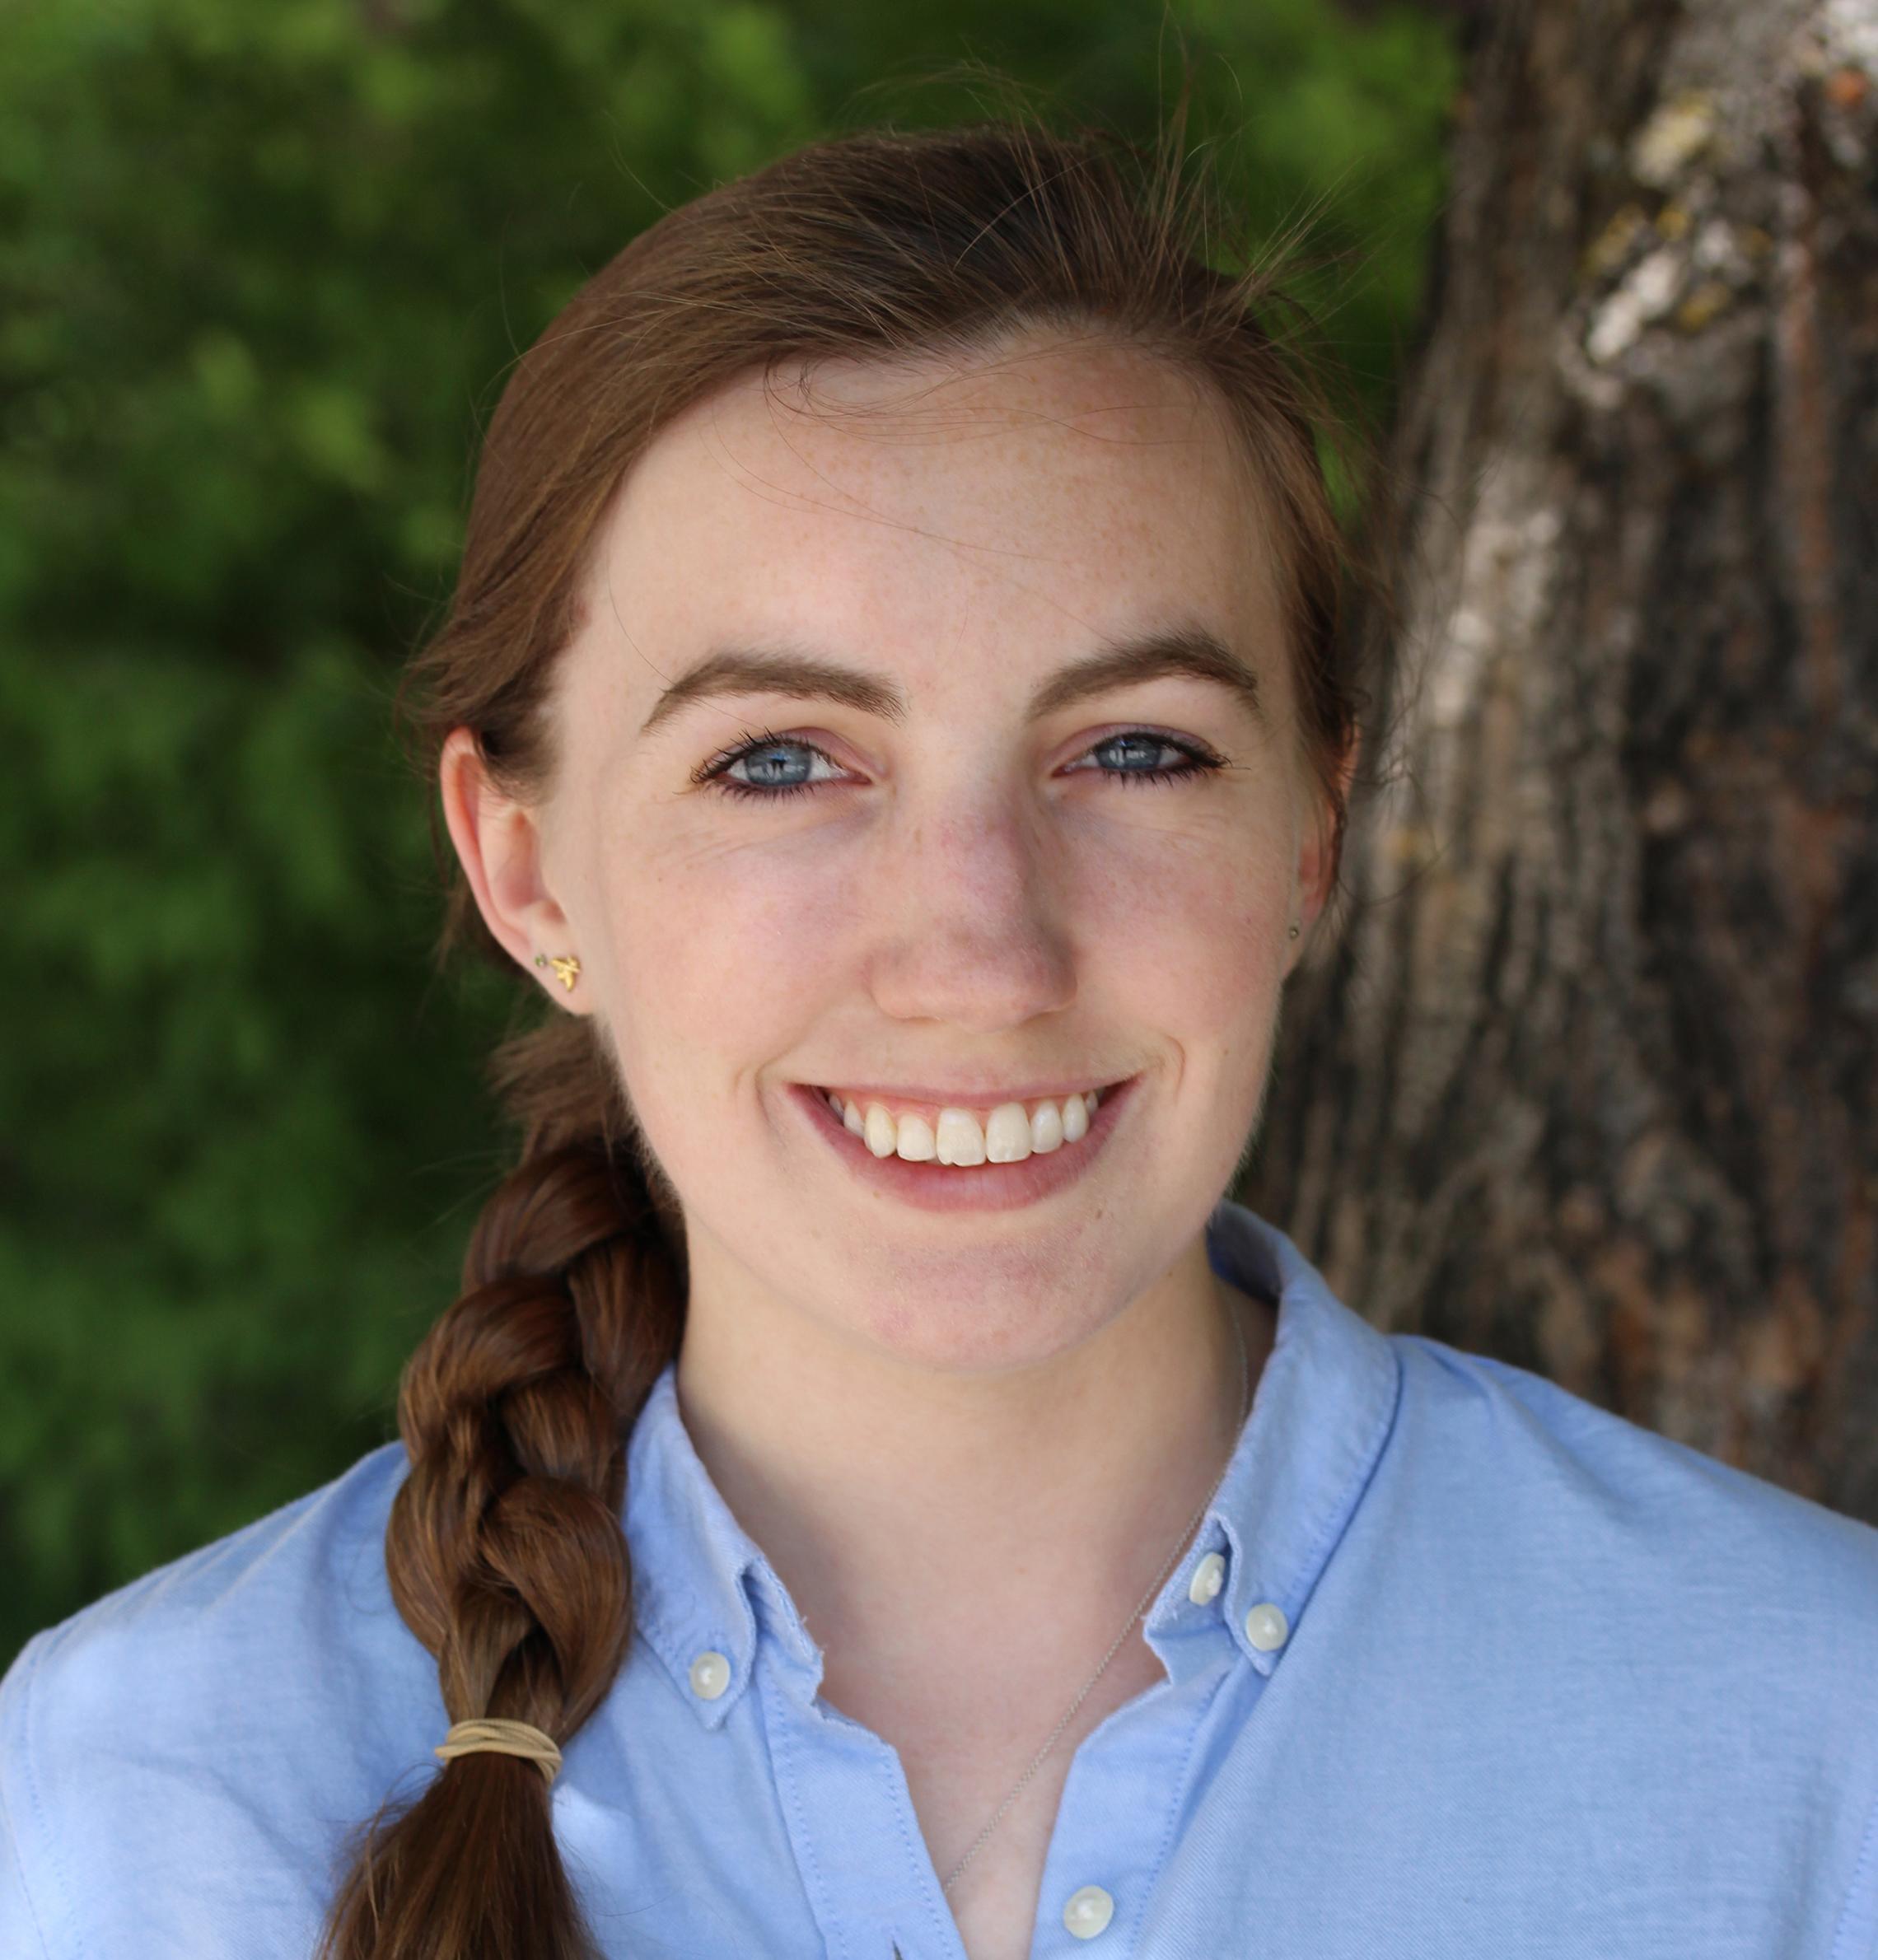 Sarah Lusk - Graduate Student - Kristen Kwan Lab